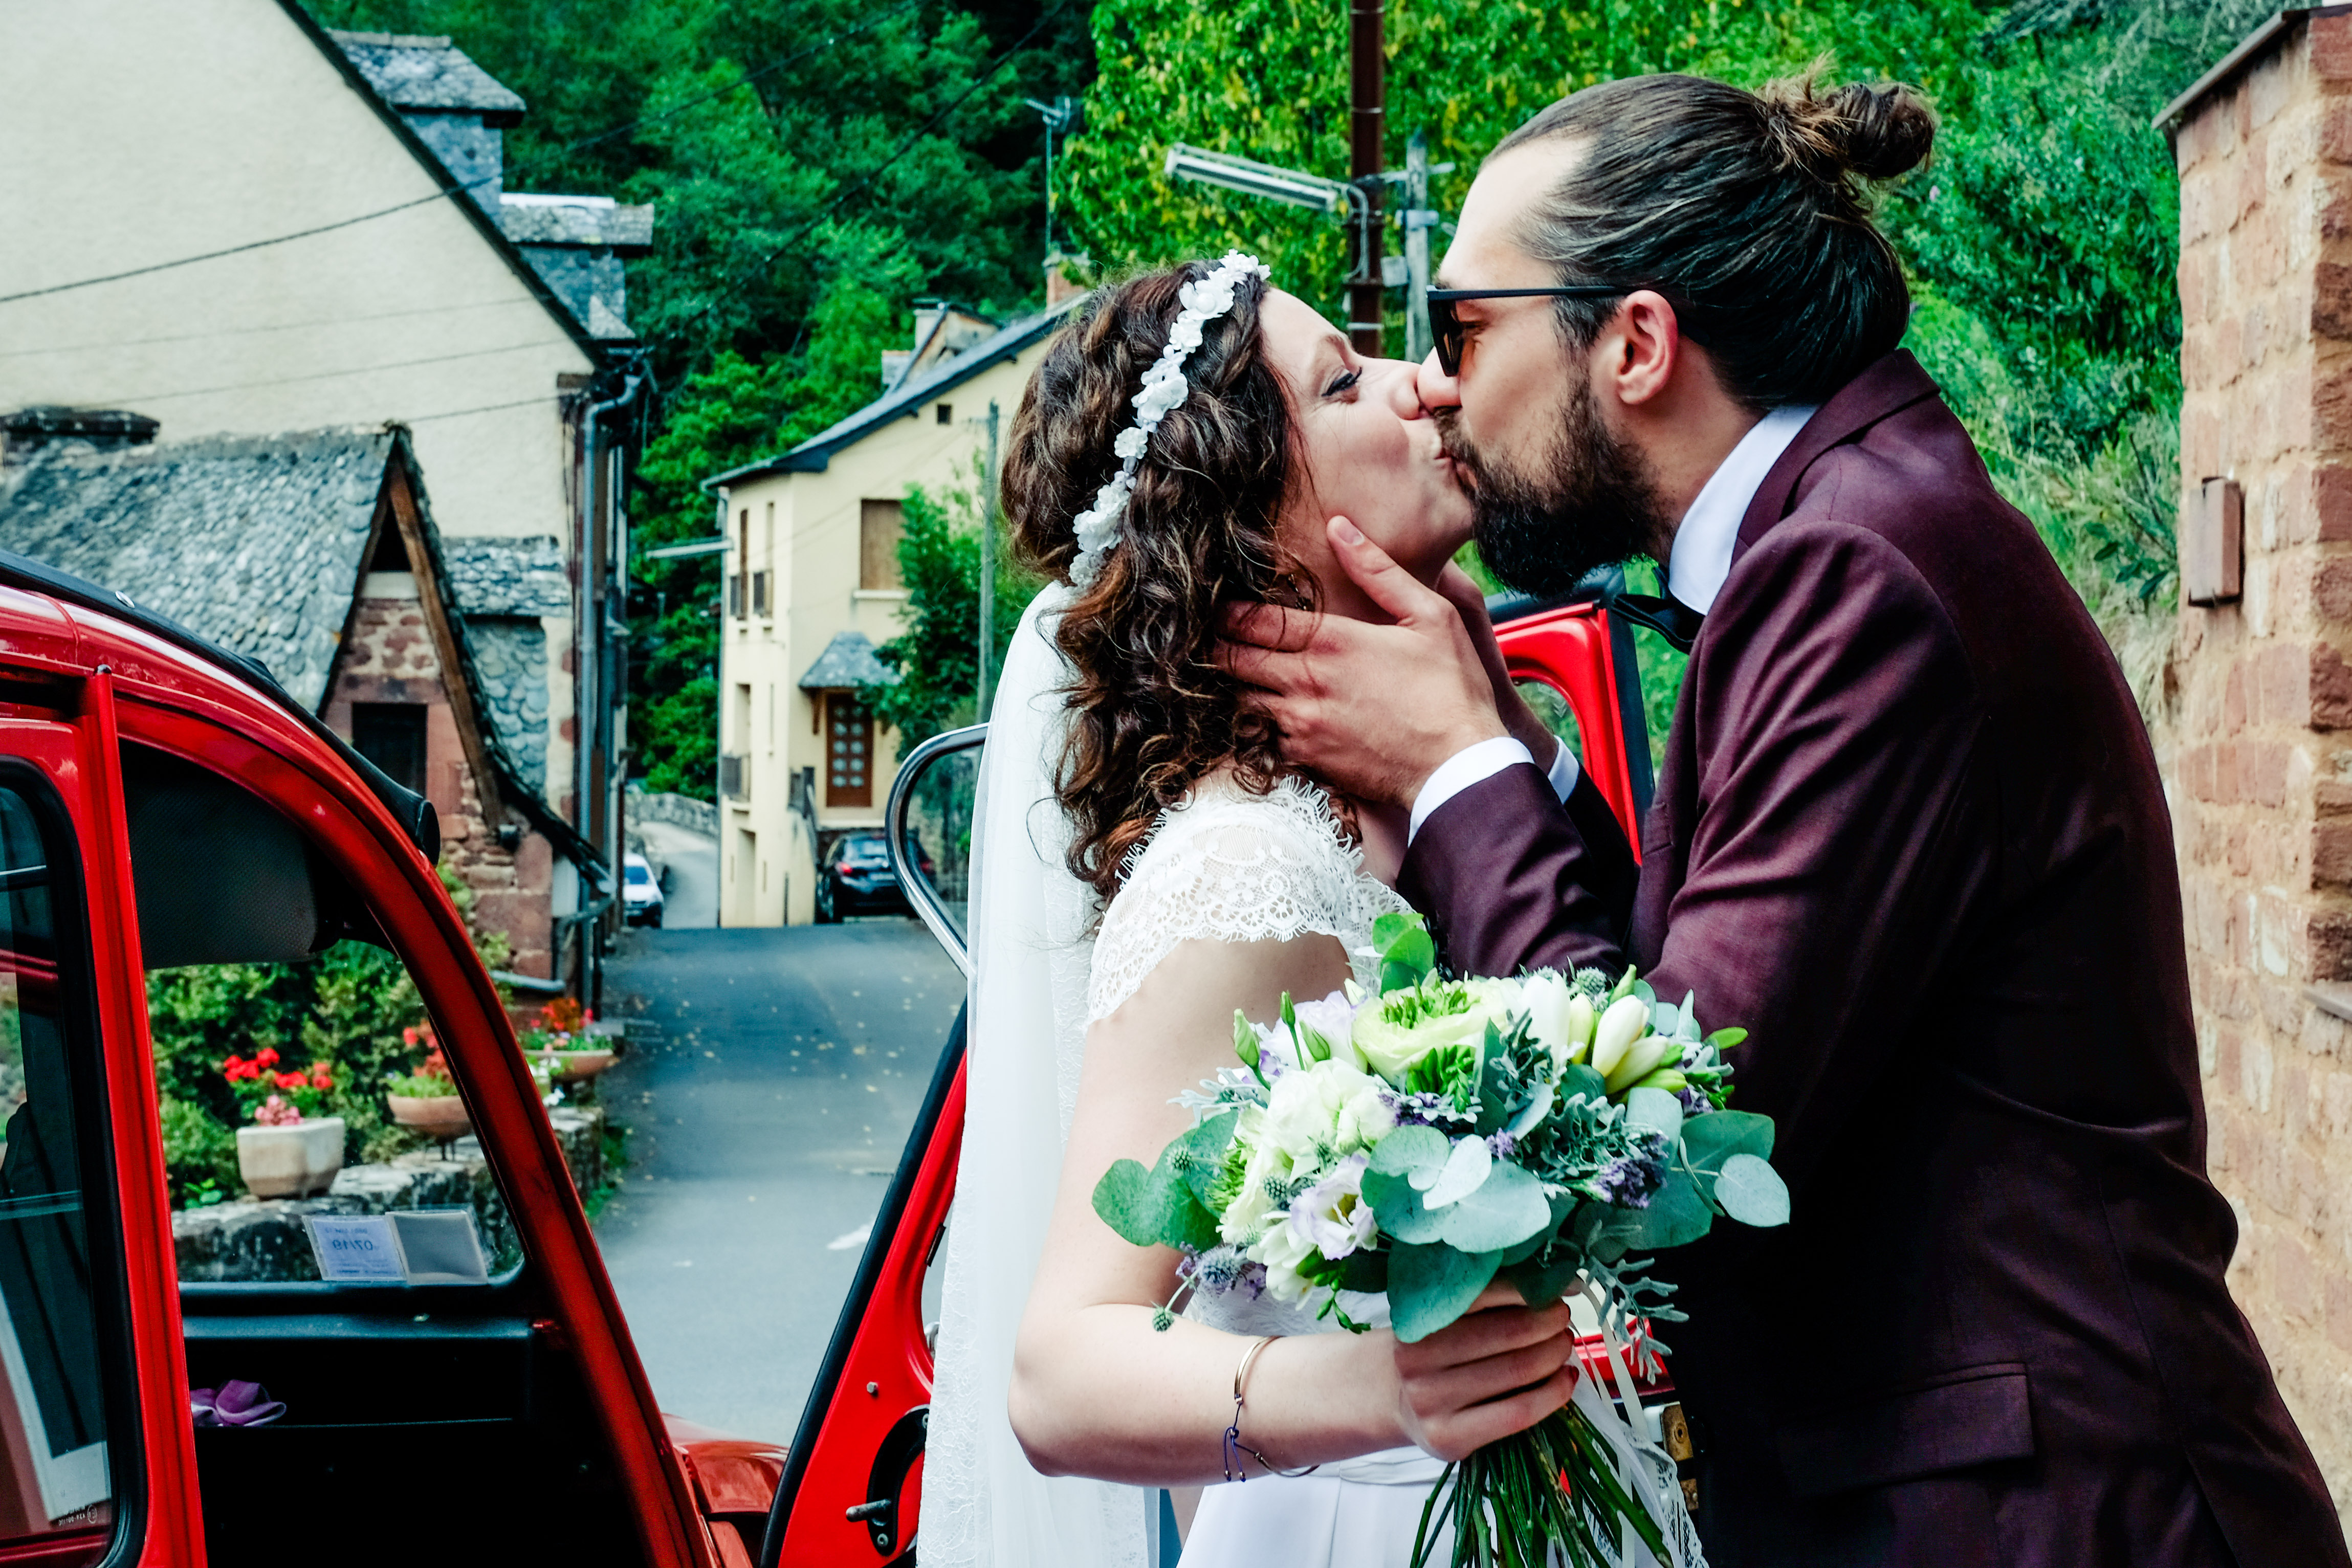 Mariage de Maëliss